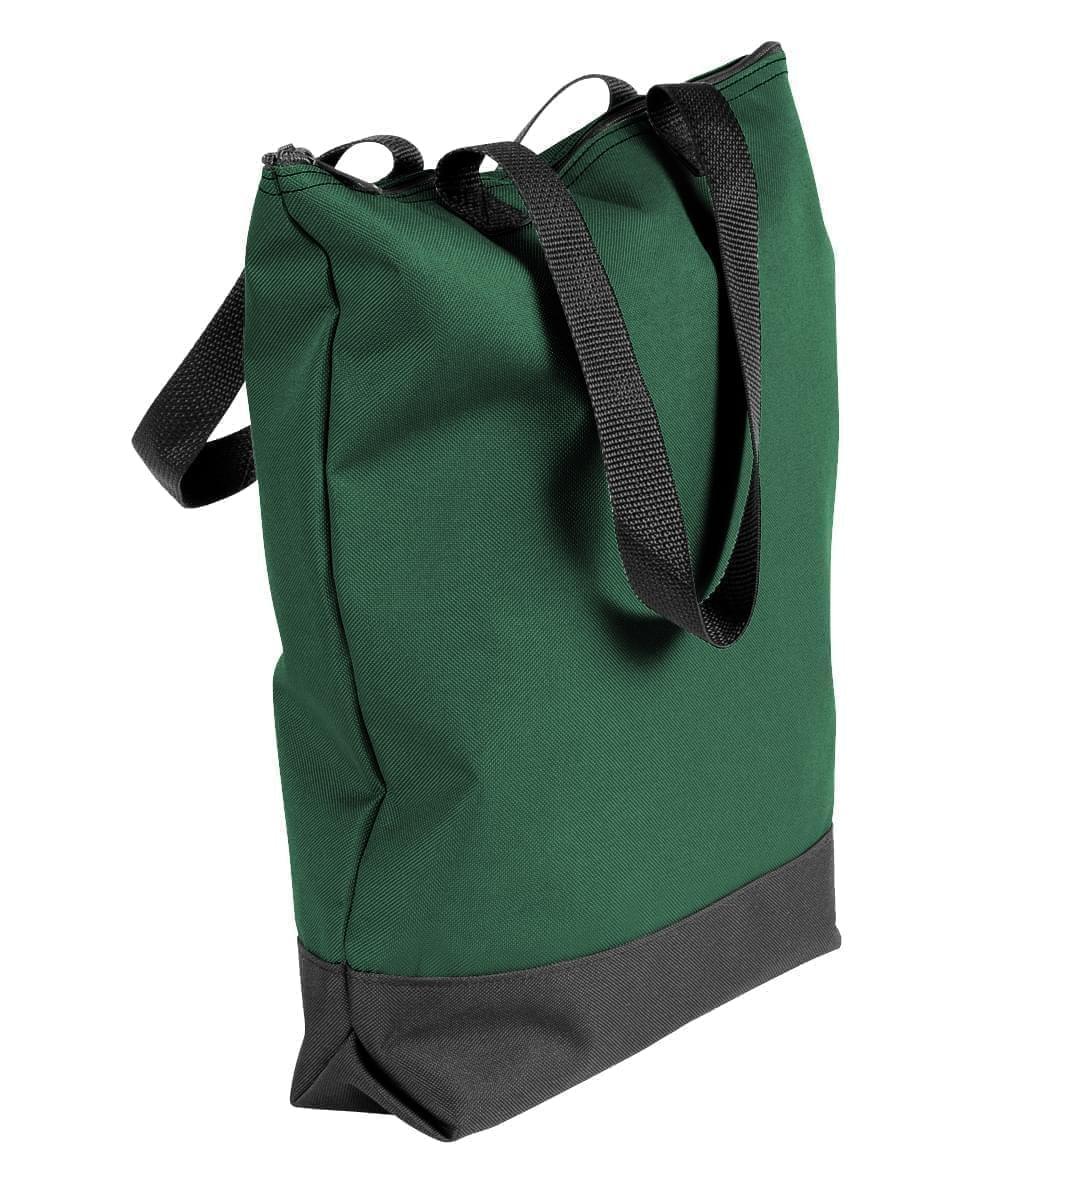 USA Made Canvas Portfolio Tote Bags, Hunter Green-Black, 1AAMX1UAIR